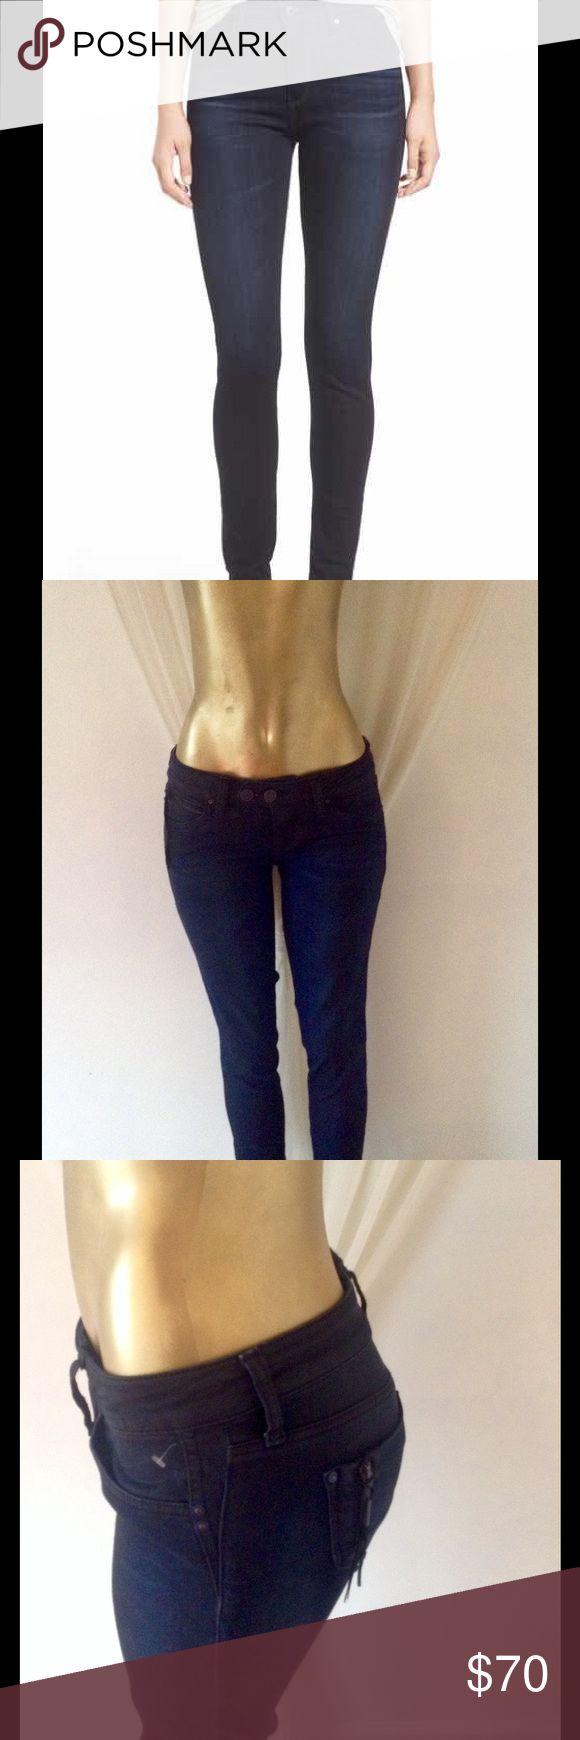 🌹 MAVI SKINNY'S 🌹 🌹 CLOSET STAPLE MAVI SKINNY JEANS 🌹 Jeans Skinny